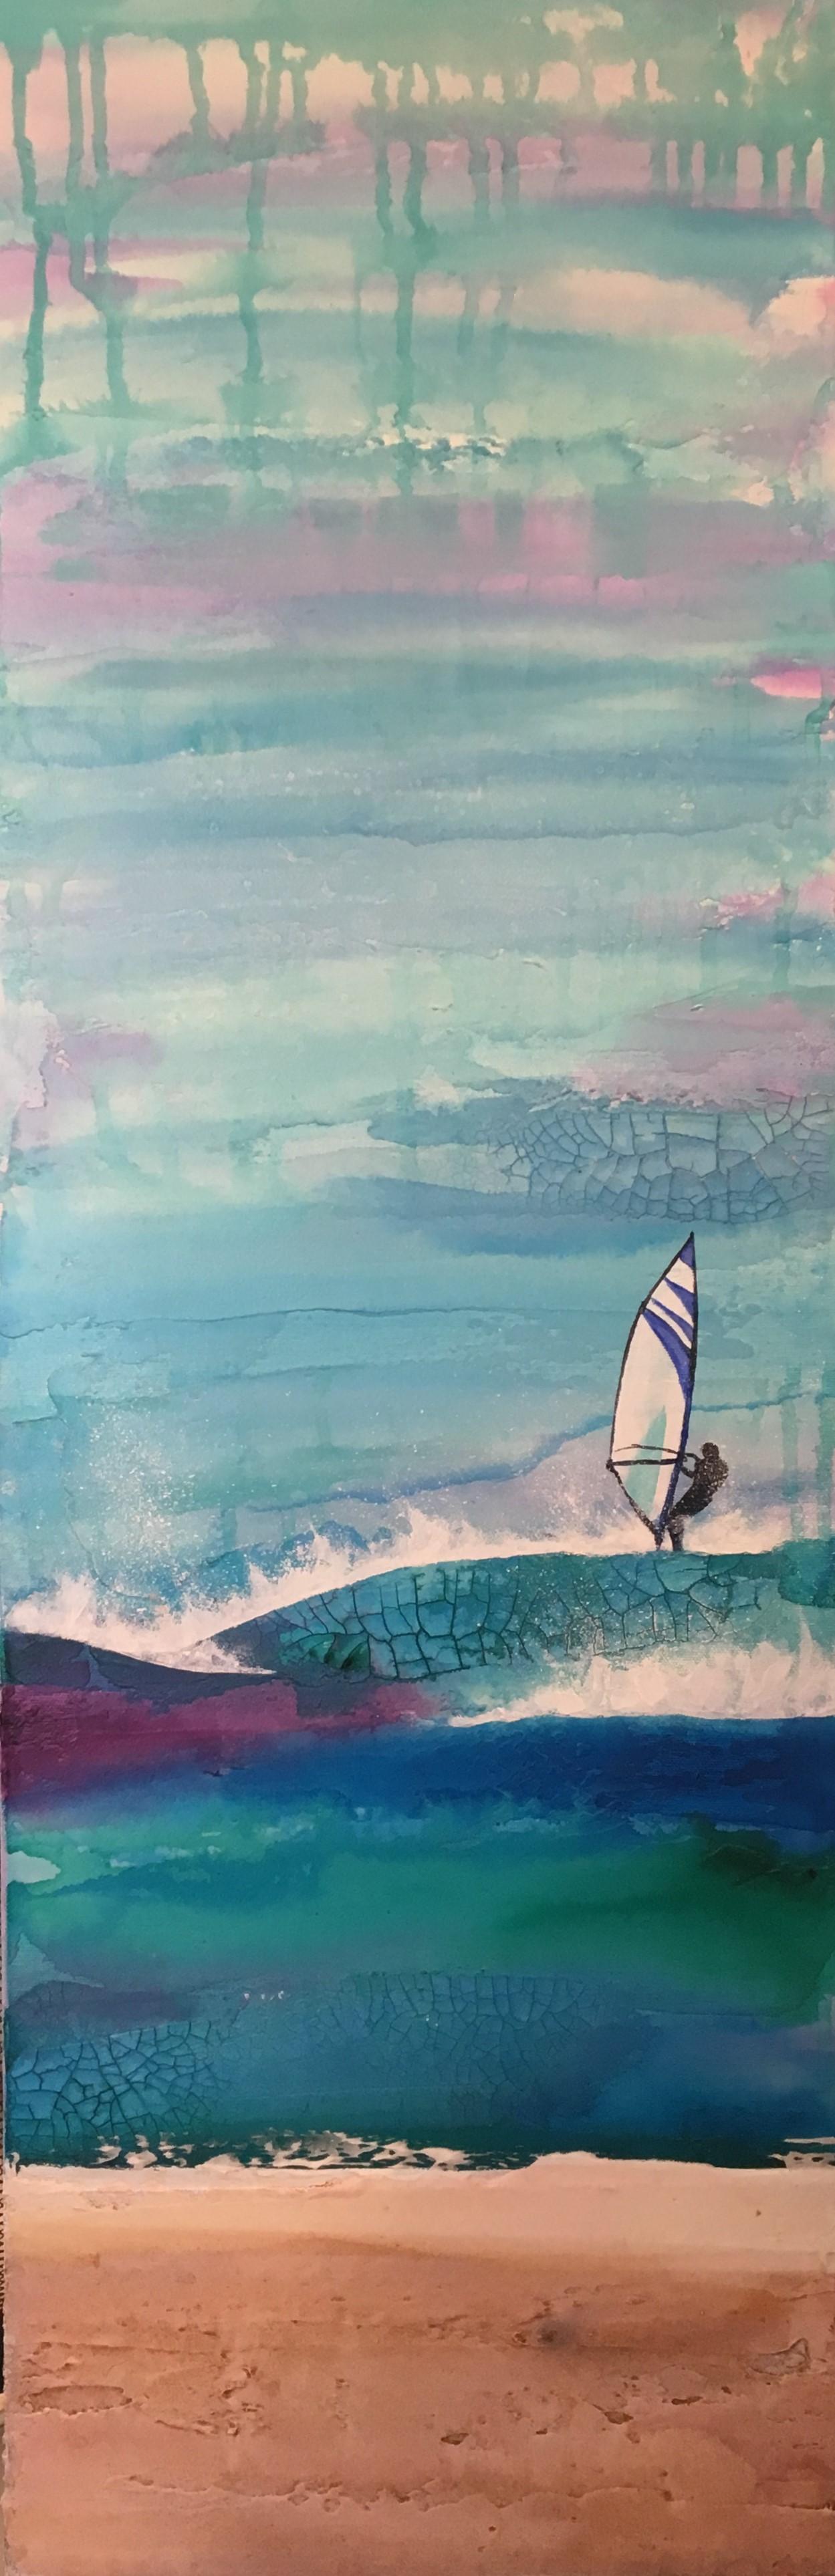 Sailing in the Rain